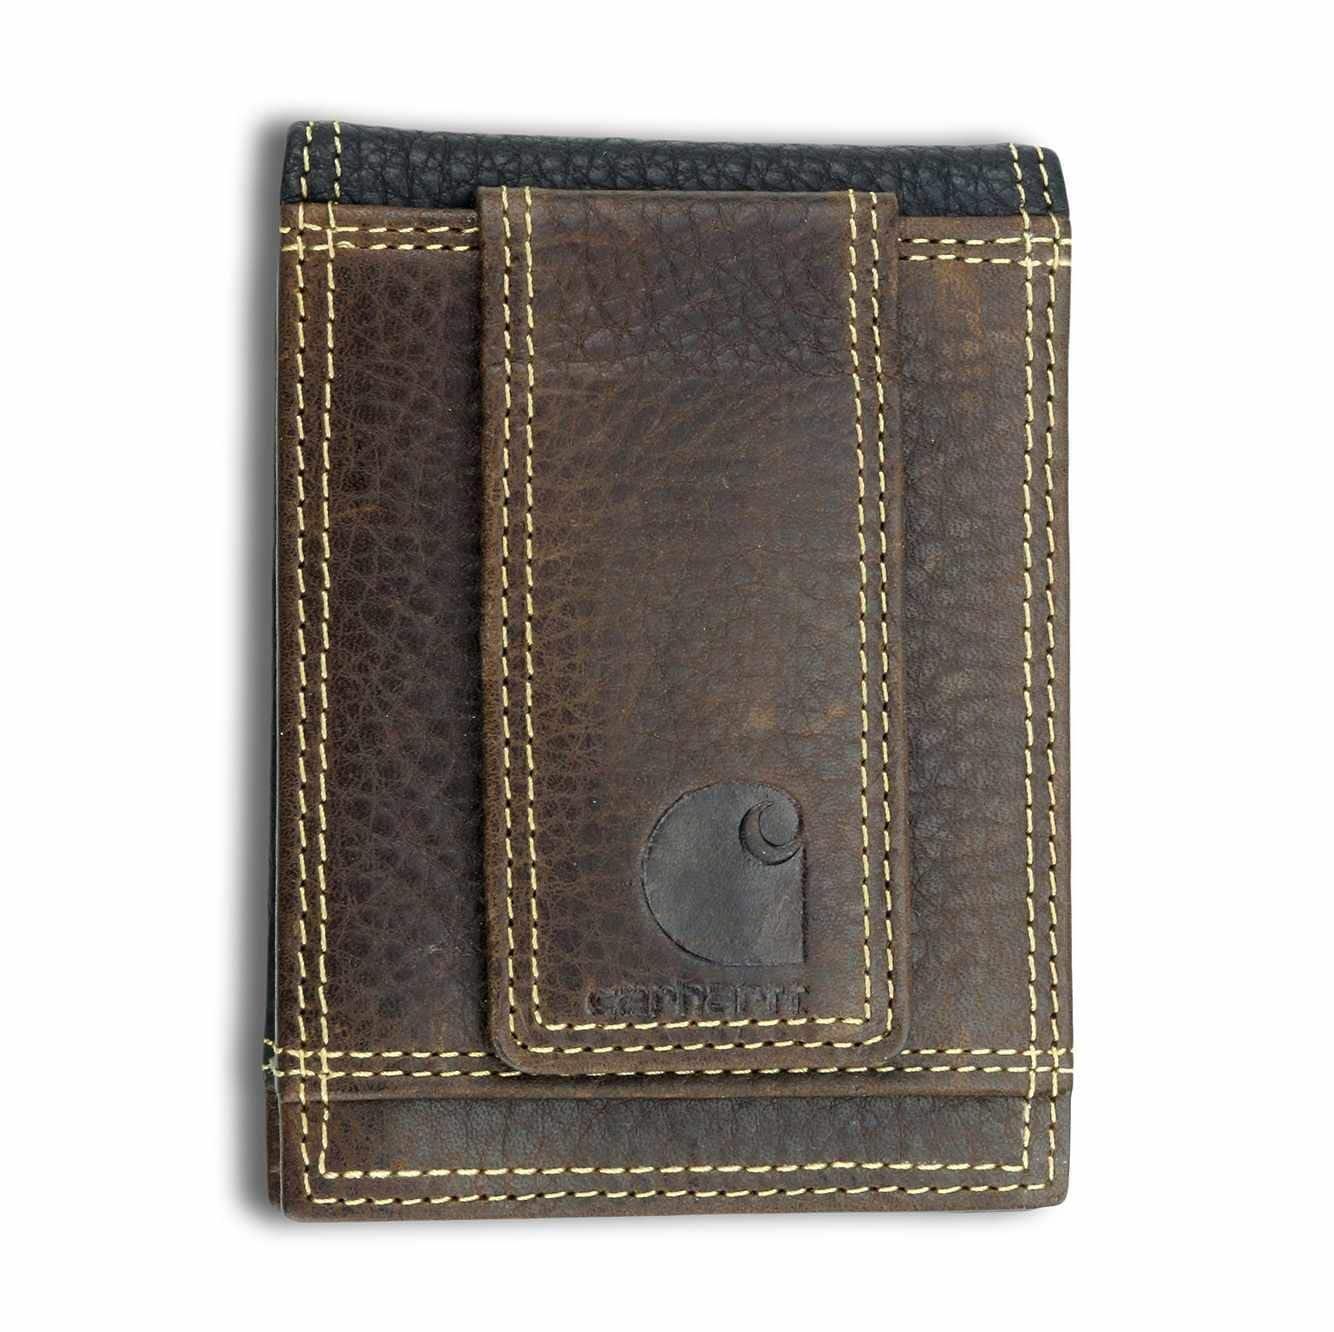 Carhartt Magnetic Front Pocket